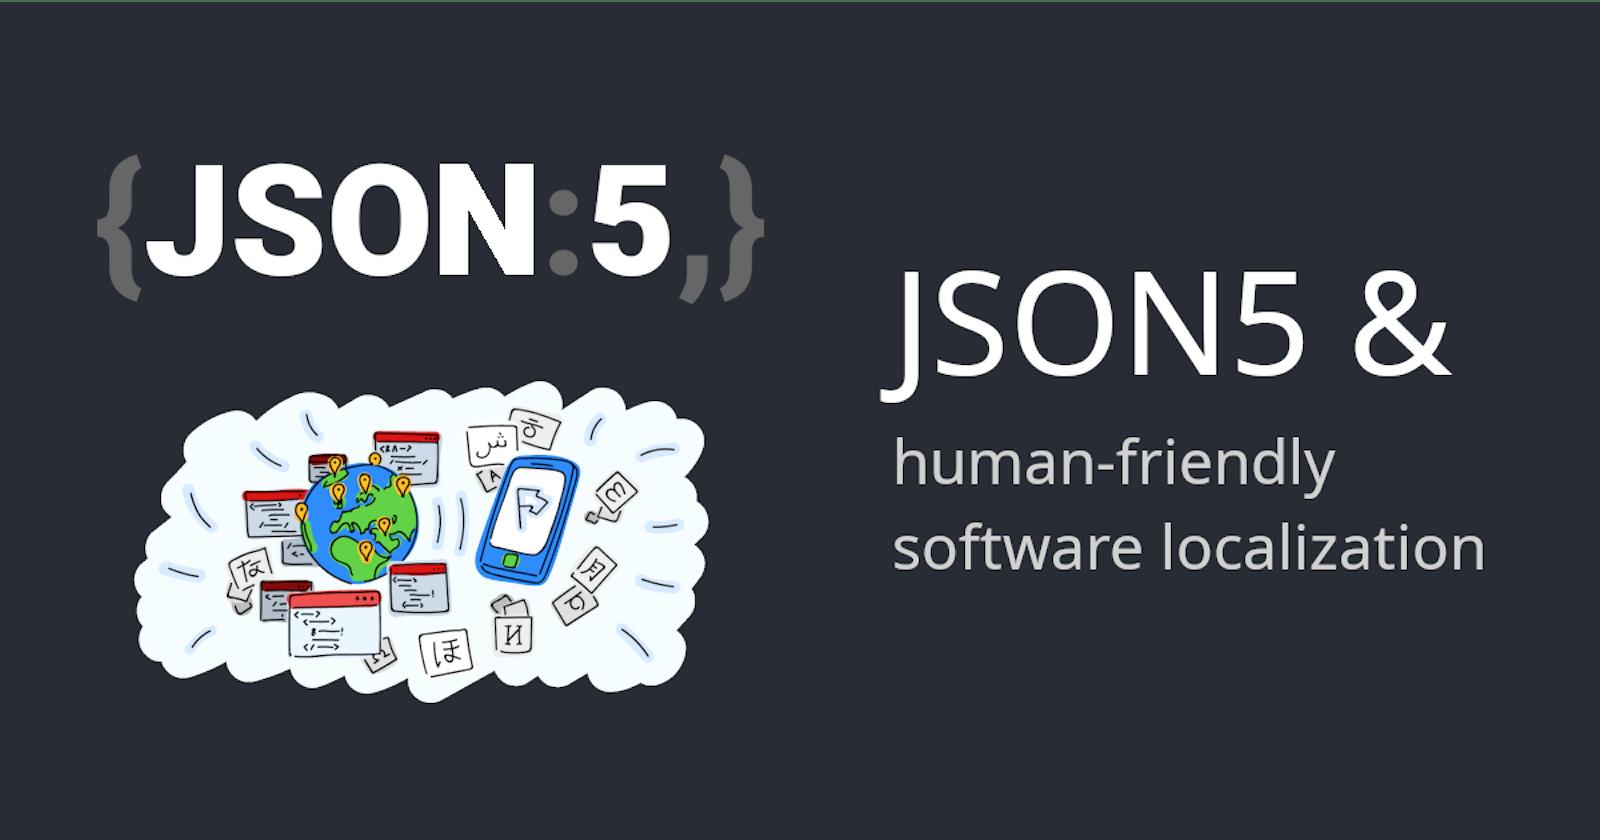 JSON5 & human-friendly software localization